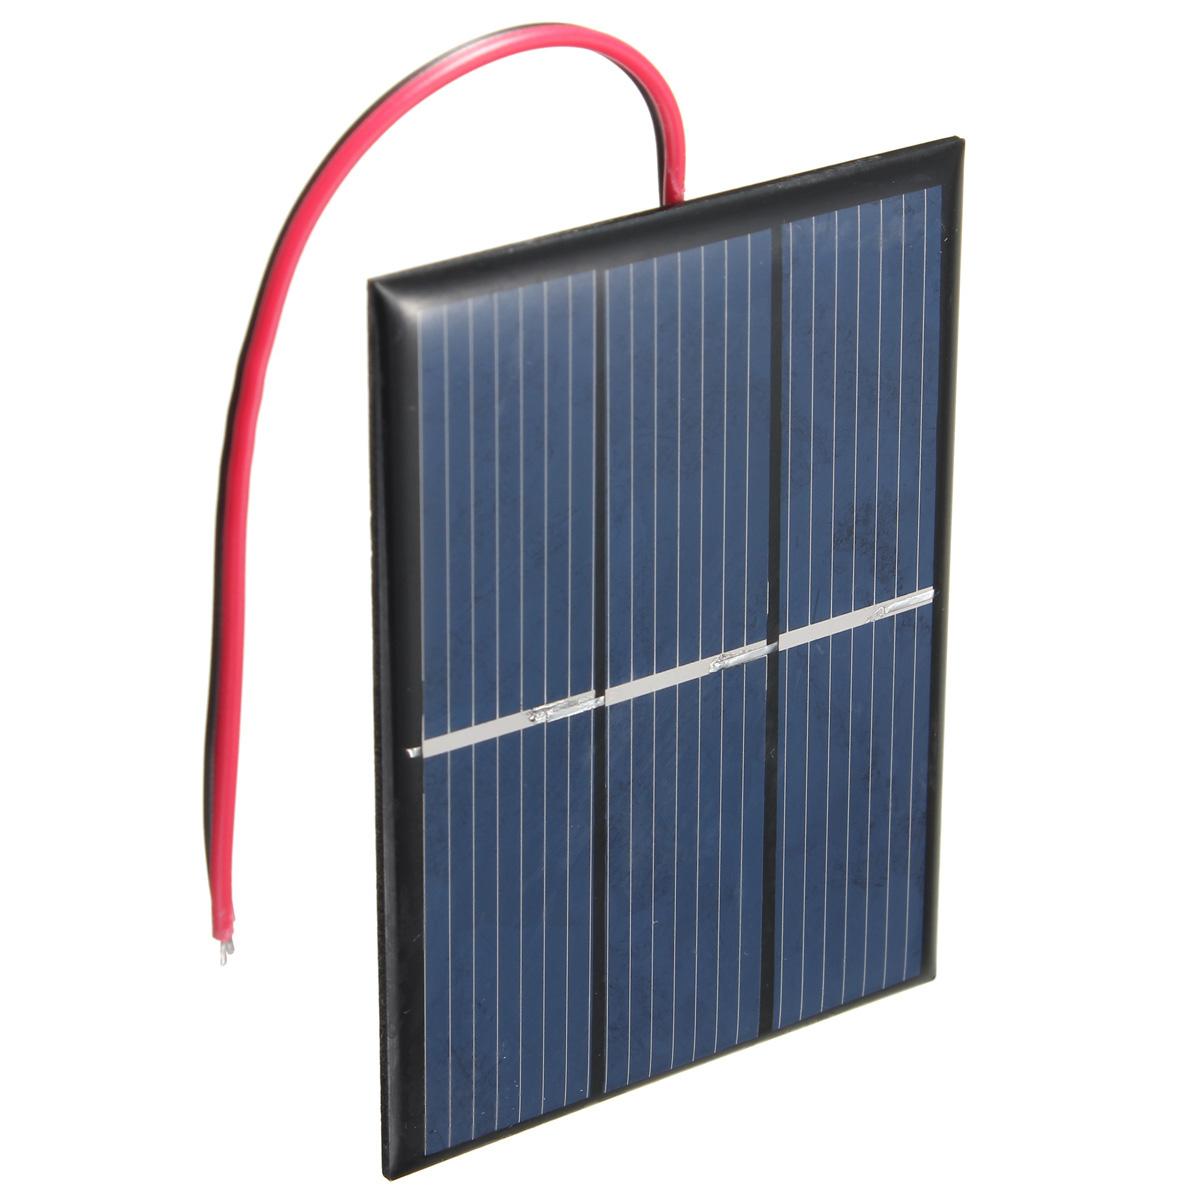 Information How to build a 300 watt solar panel ~ George Mayda